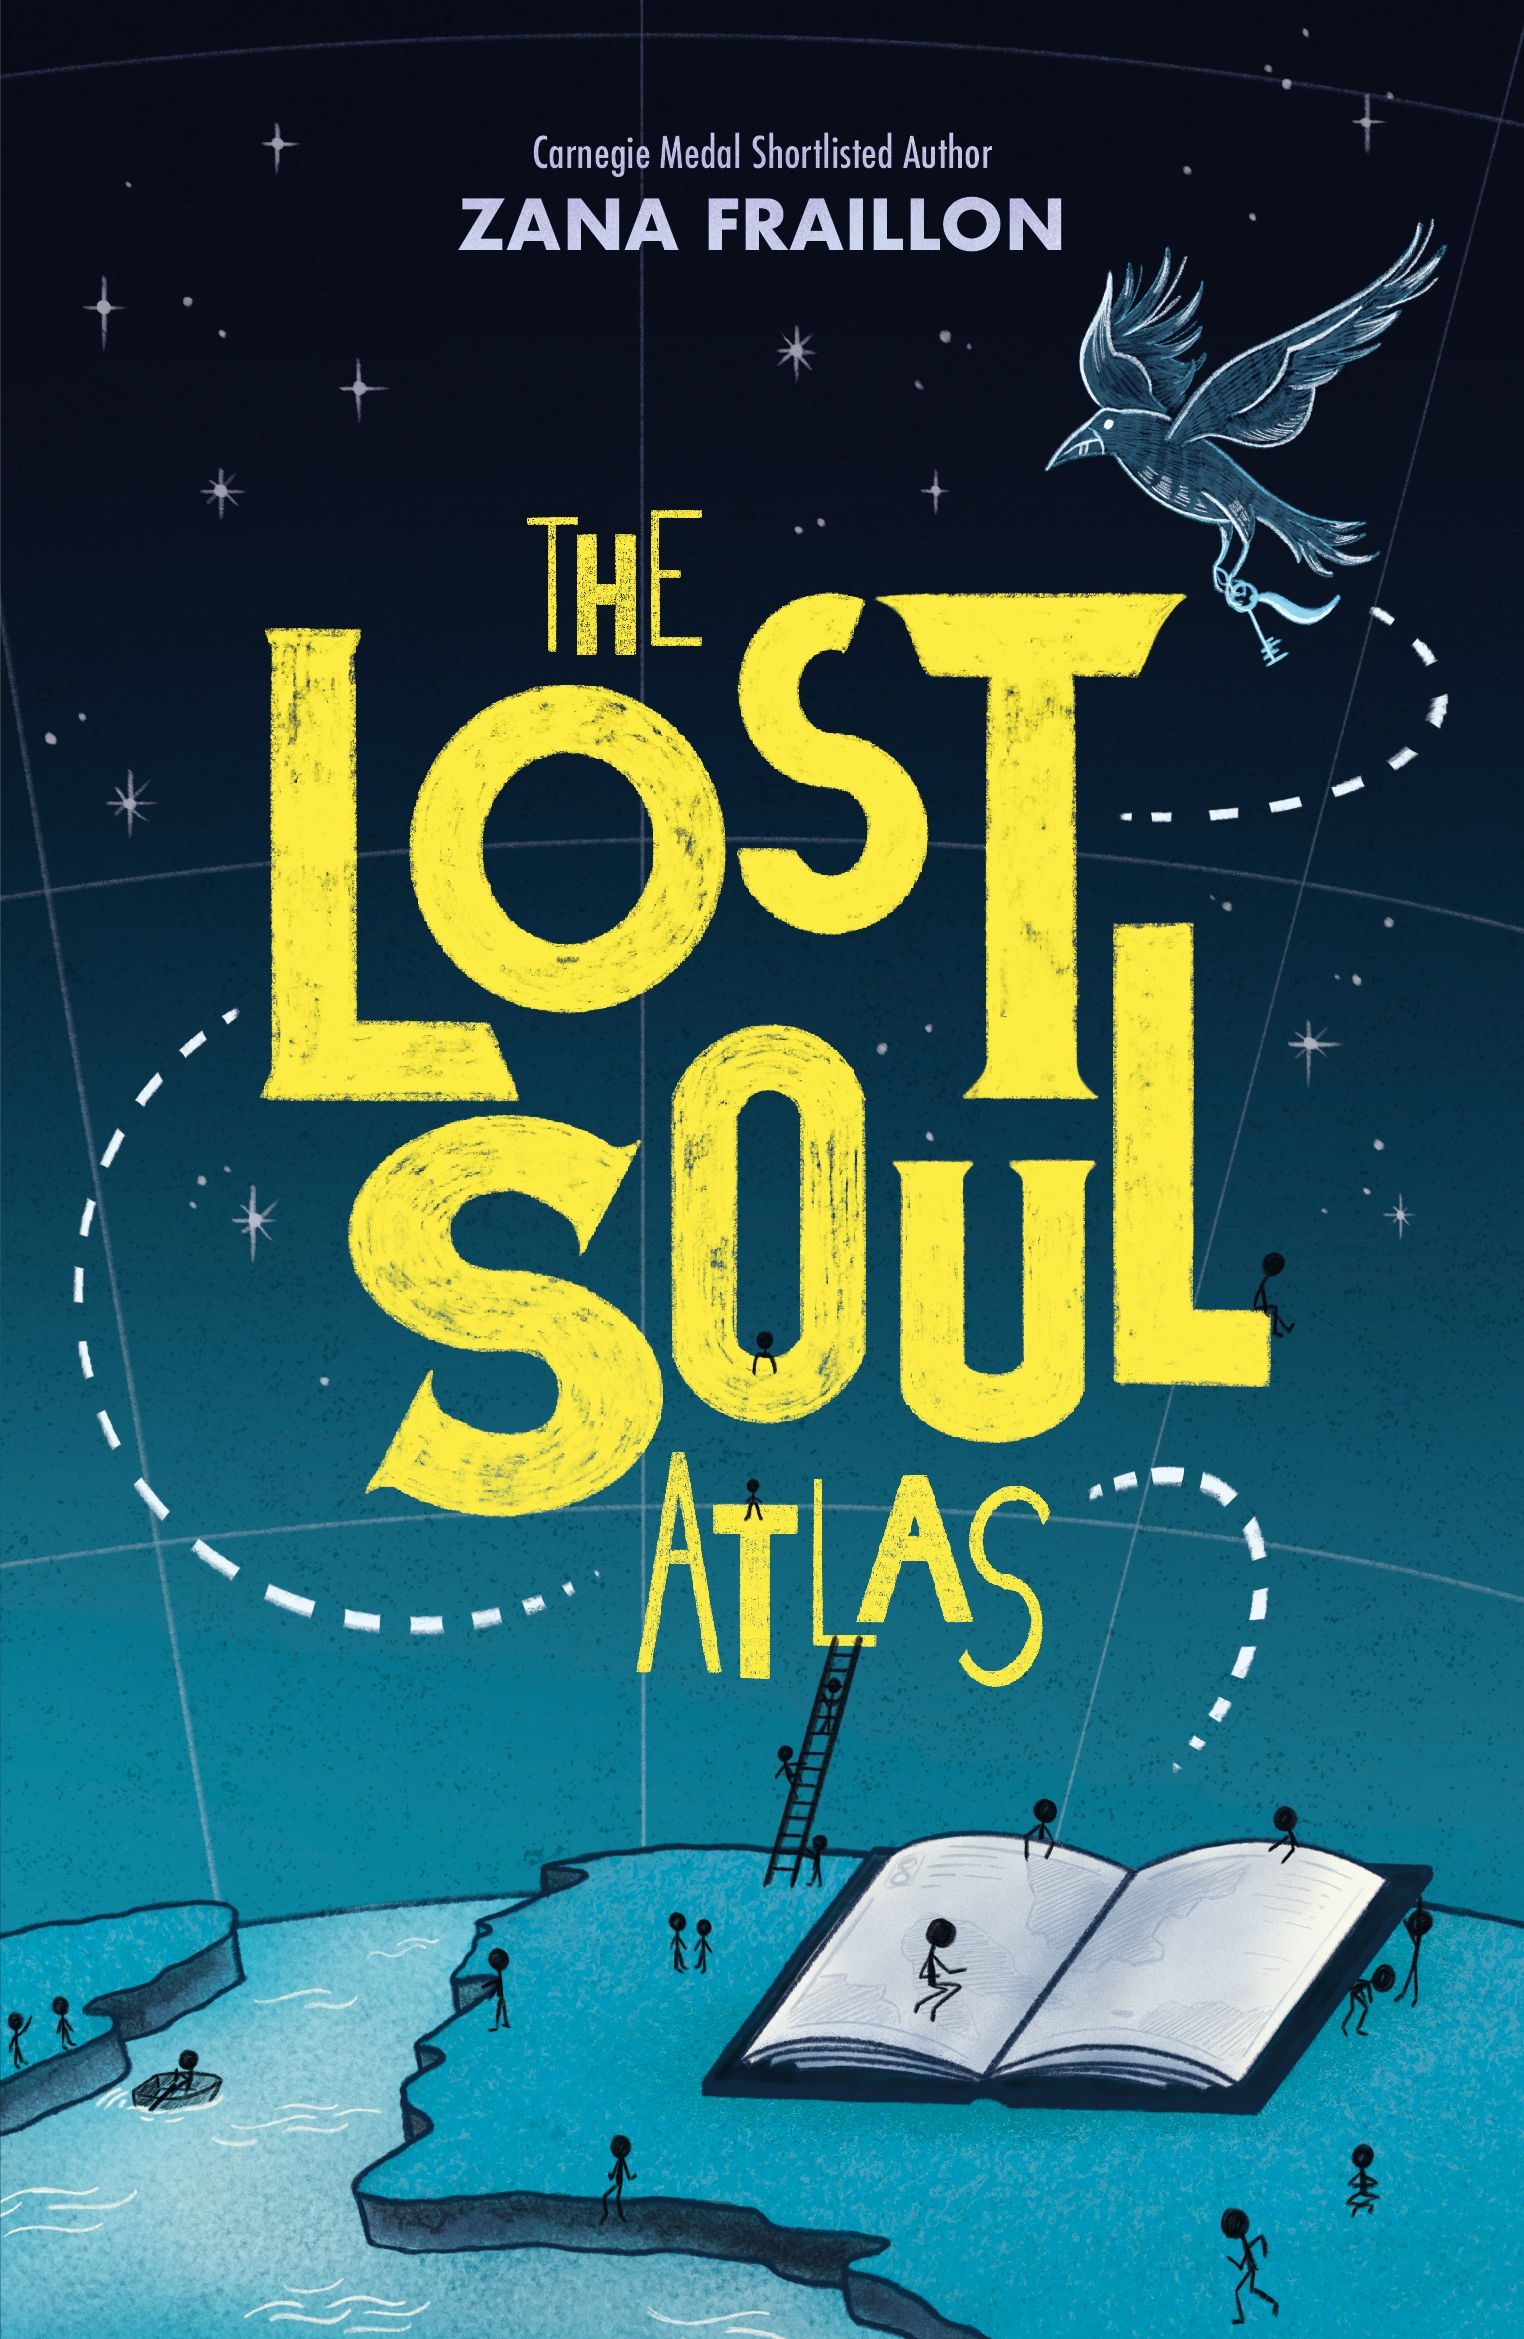 The Lost Soul Atlas by Zana Fraillon   Hachette Childrens UK